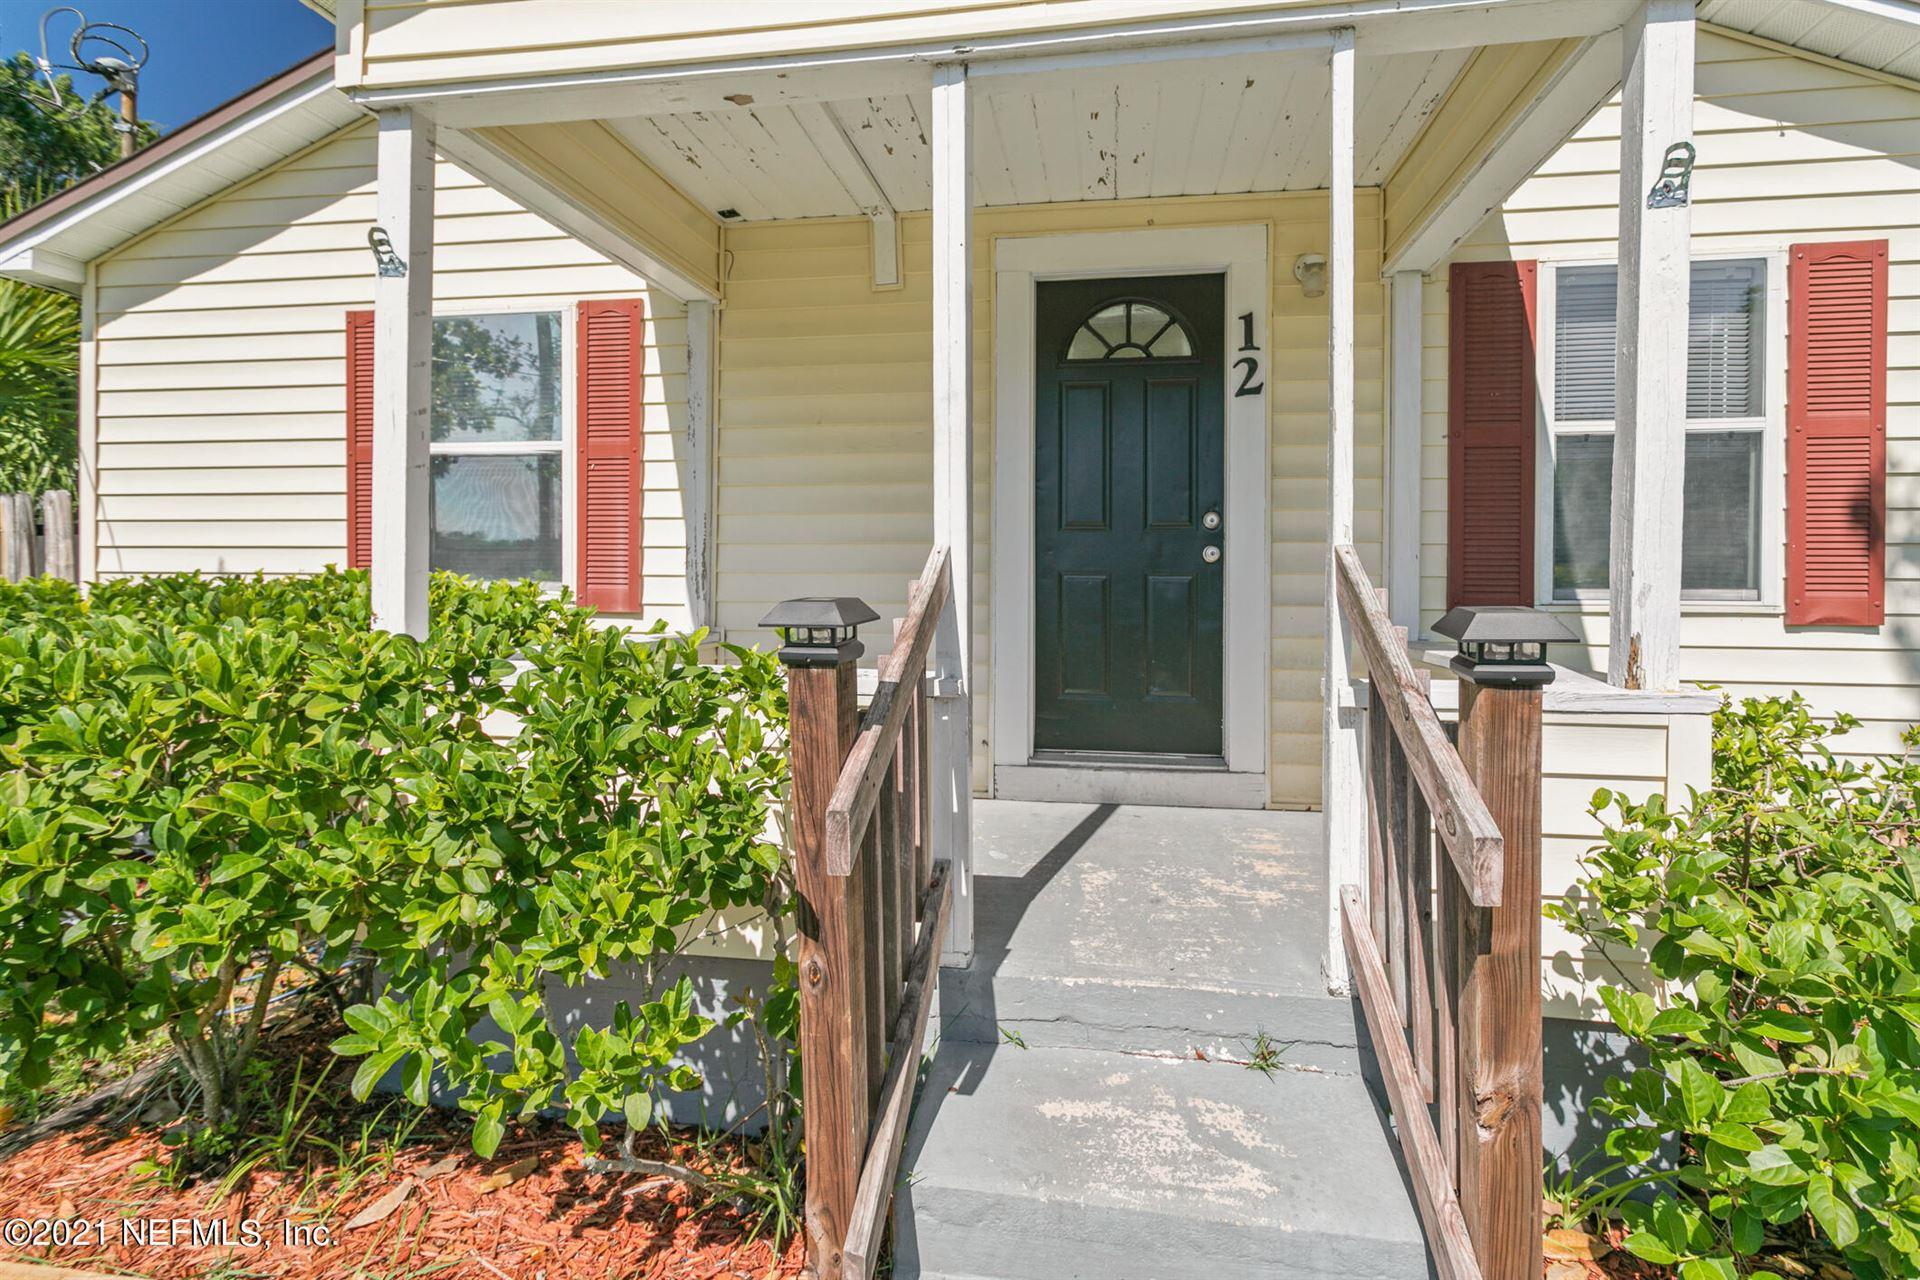 12 S OAKRIDGE AVE, Green Cove Springs, FL 32043 - MLS#: 1108796